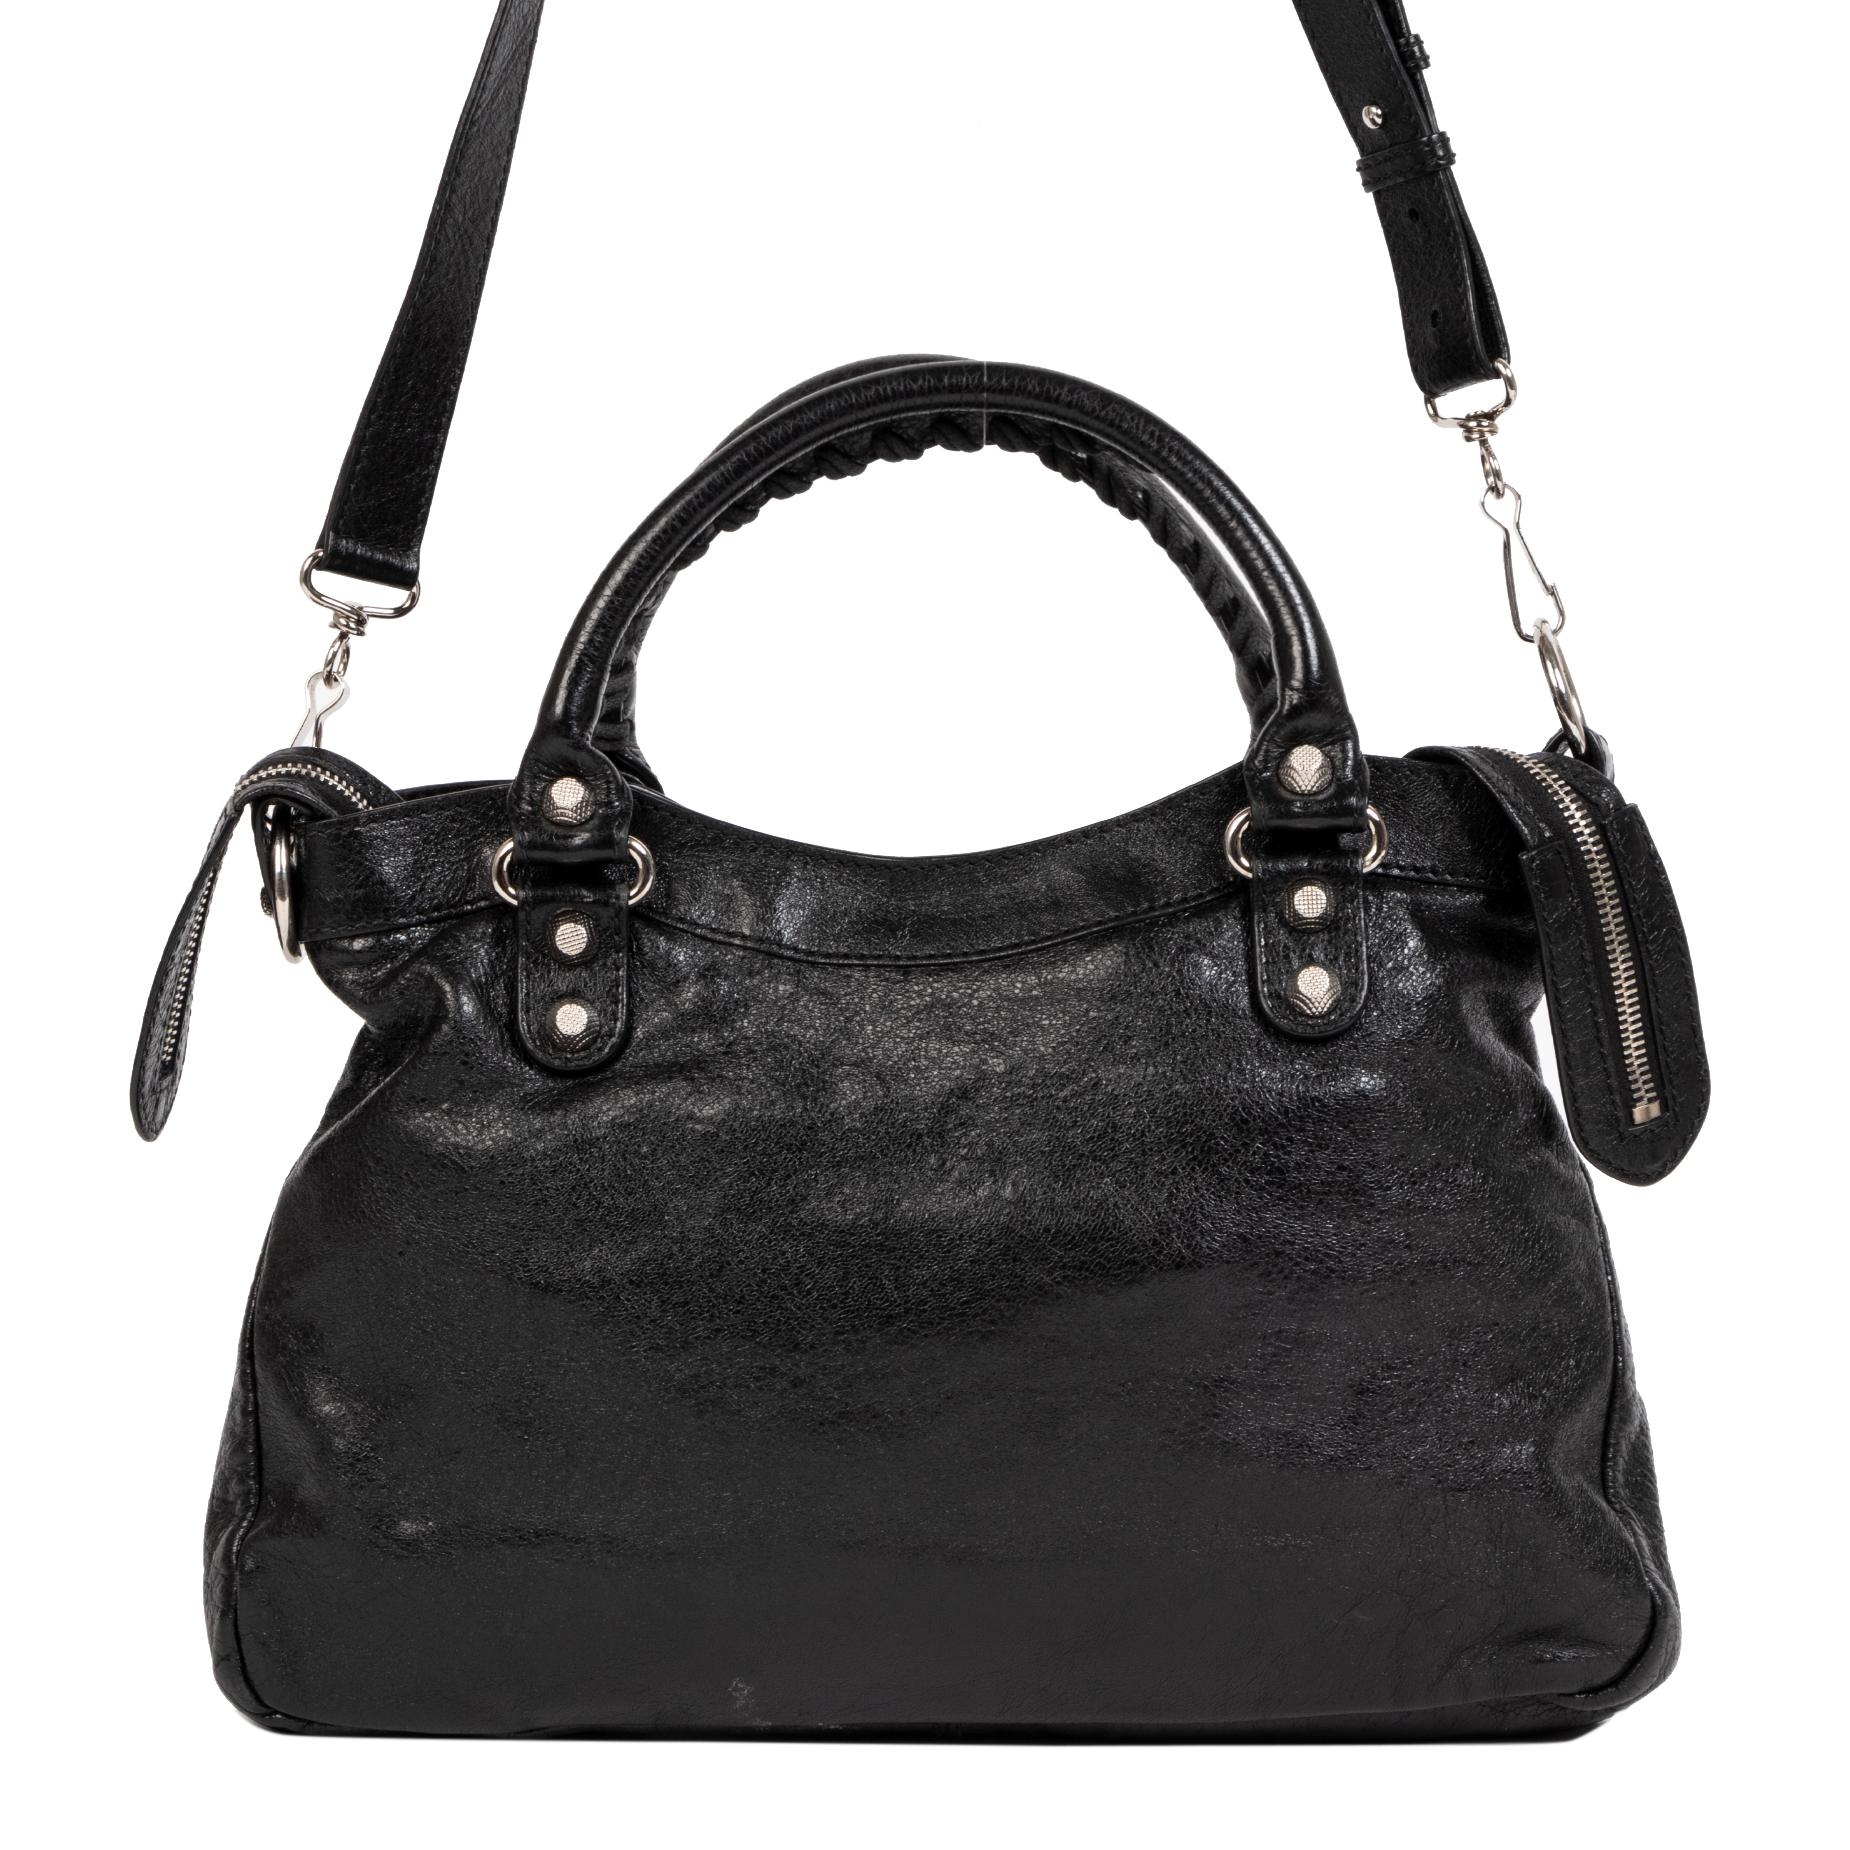 shop safe online secondhand Balenciaga Black Leather Town Bag + Strap